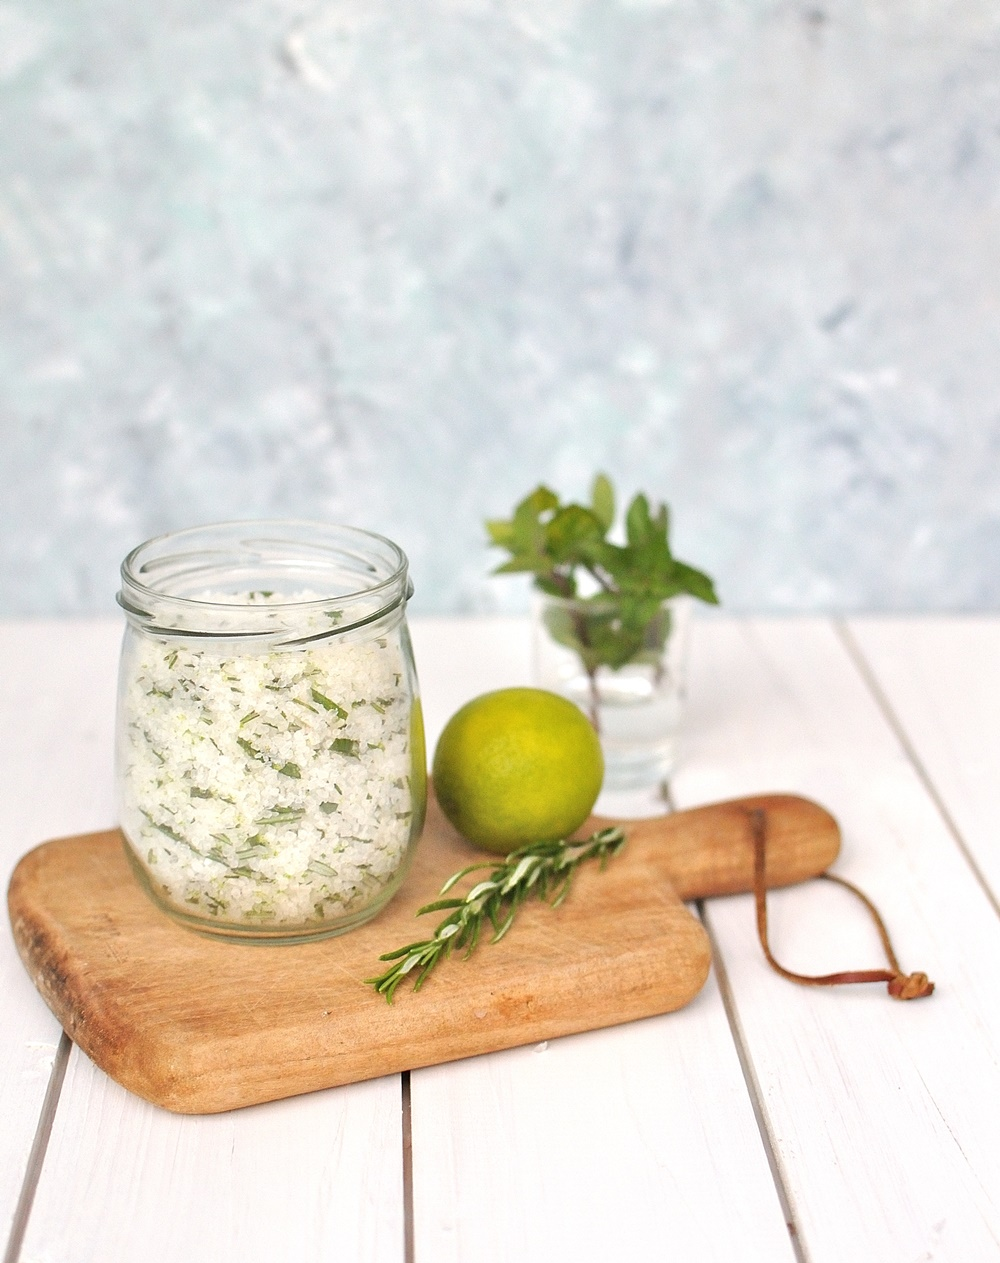 Rosmarin Salz im Glas